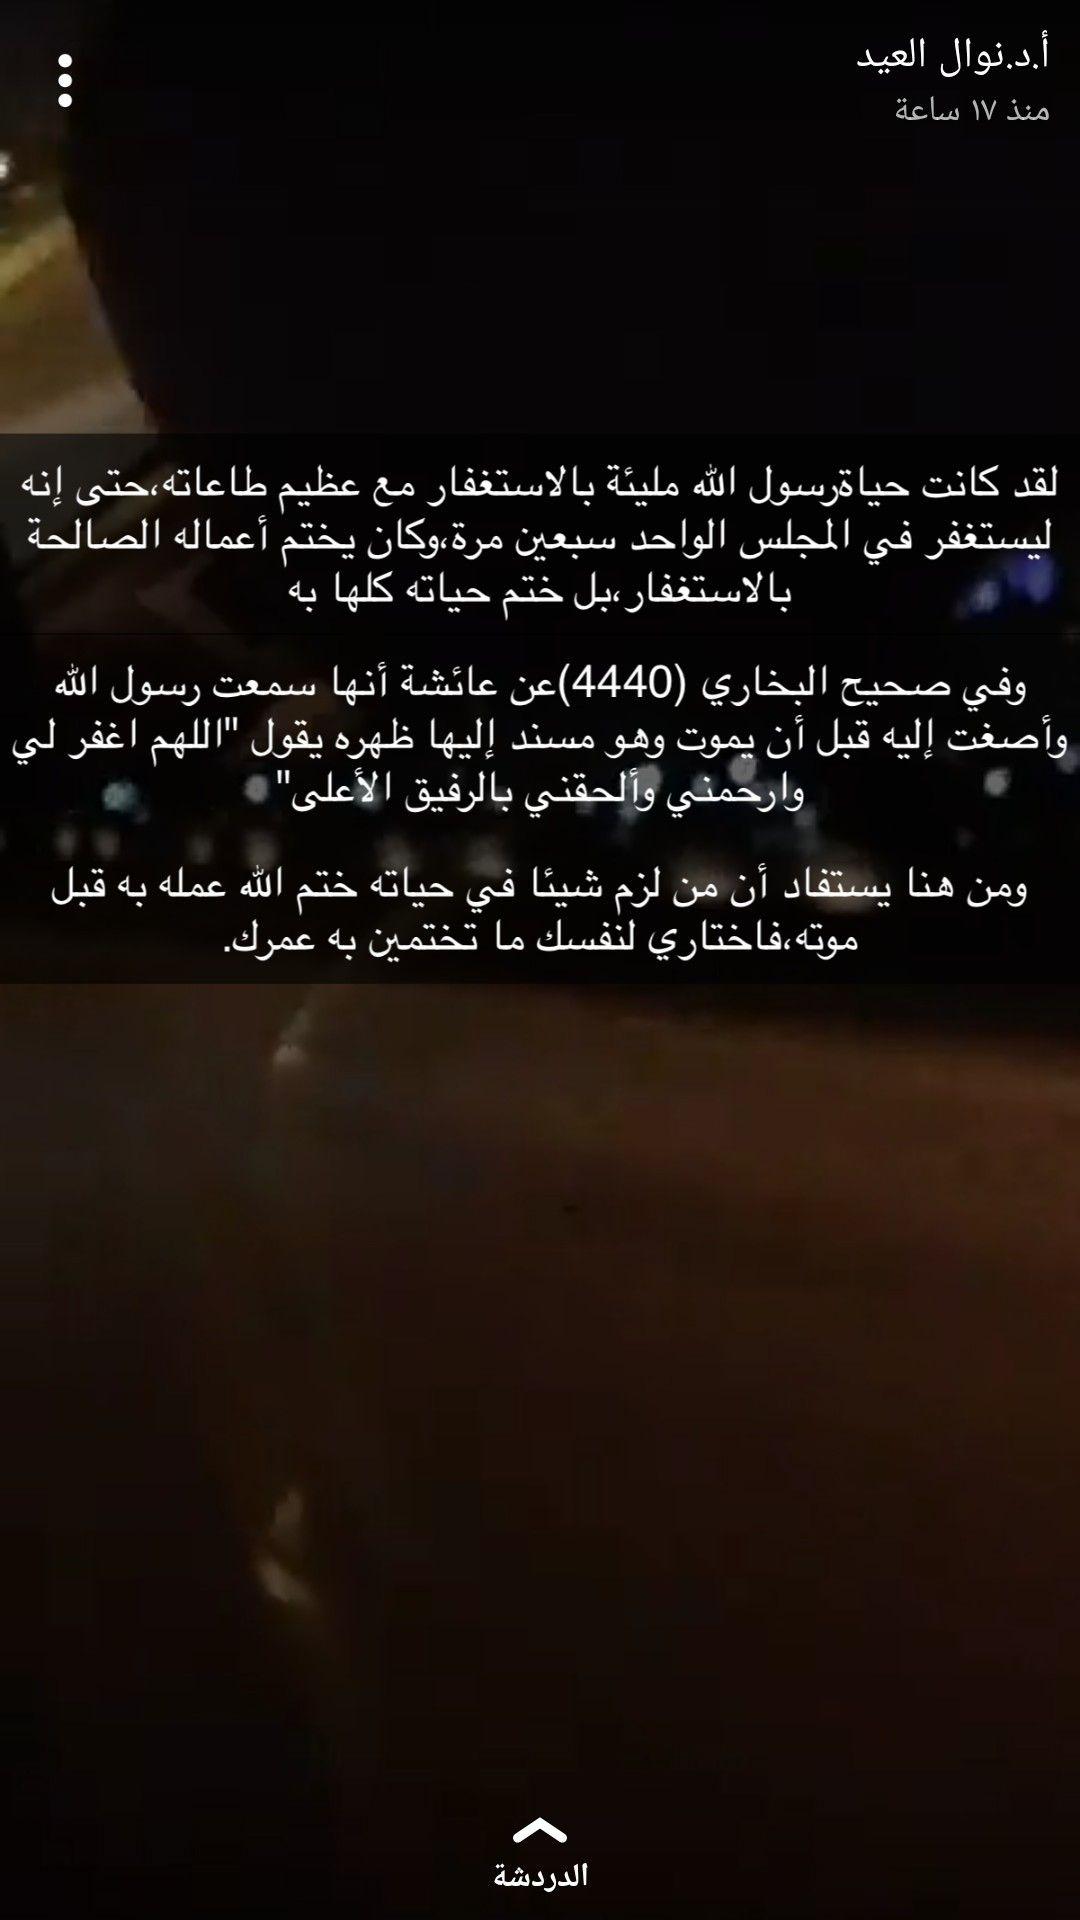 Pin By Raneem On دعاء دين اسلام اذكار Lockscreen Screenshot Lockscreen Screenshots